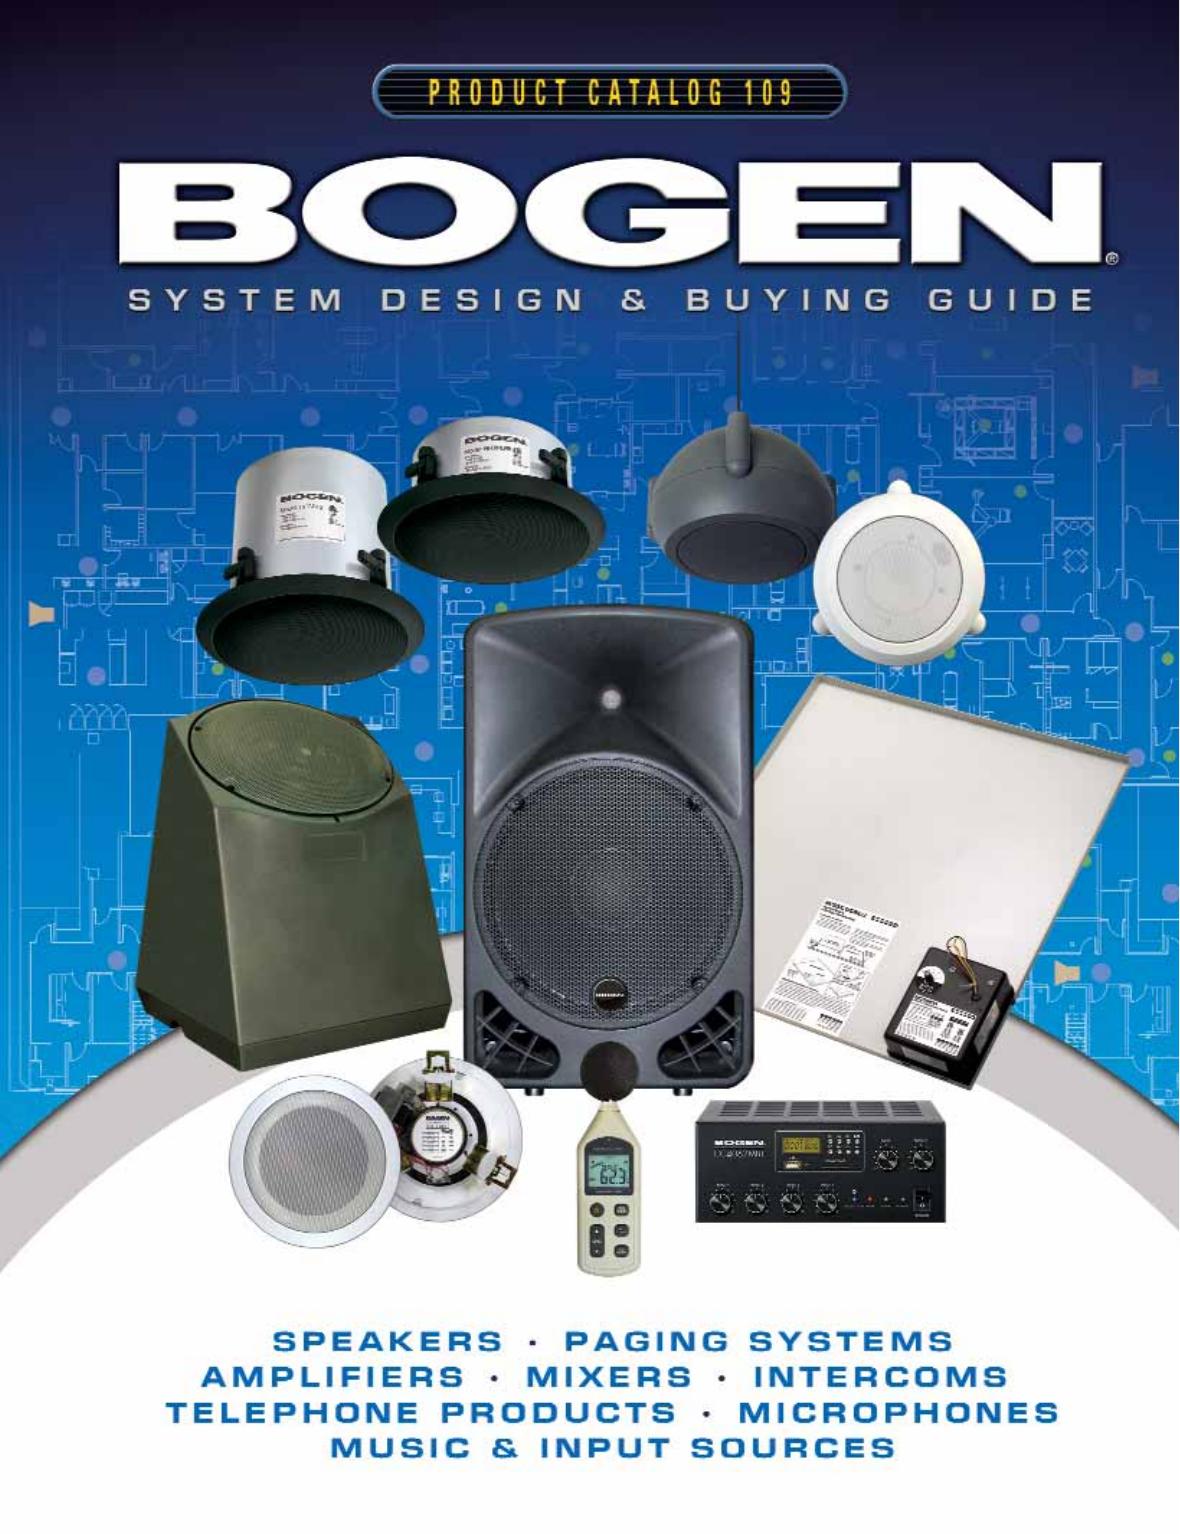 BOGEN A8T 2-Way Speaker 70 volt 64//32//16 Watts fully sealed and waterproof.